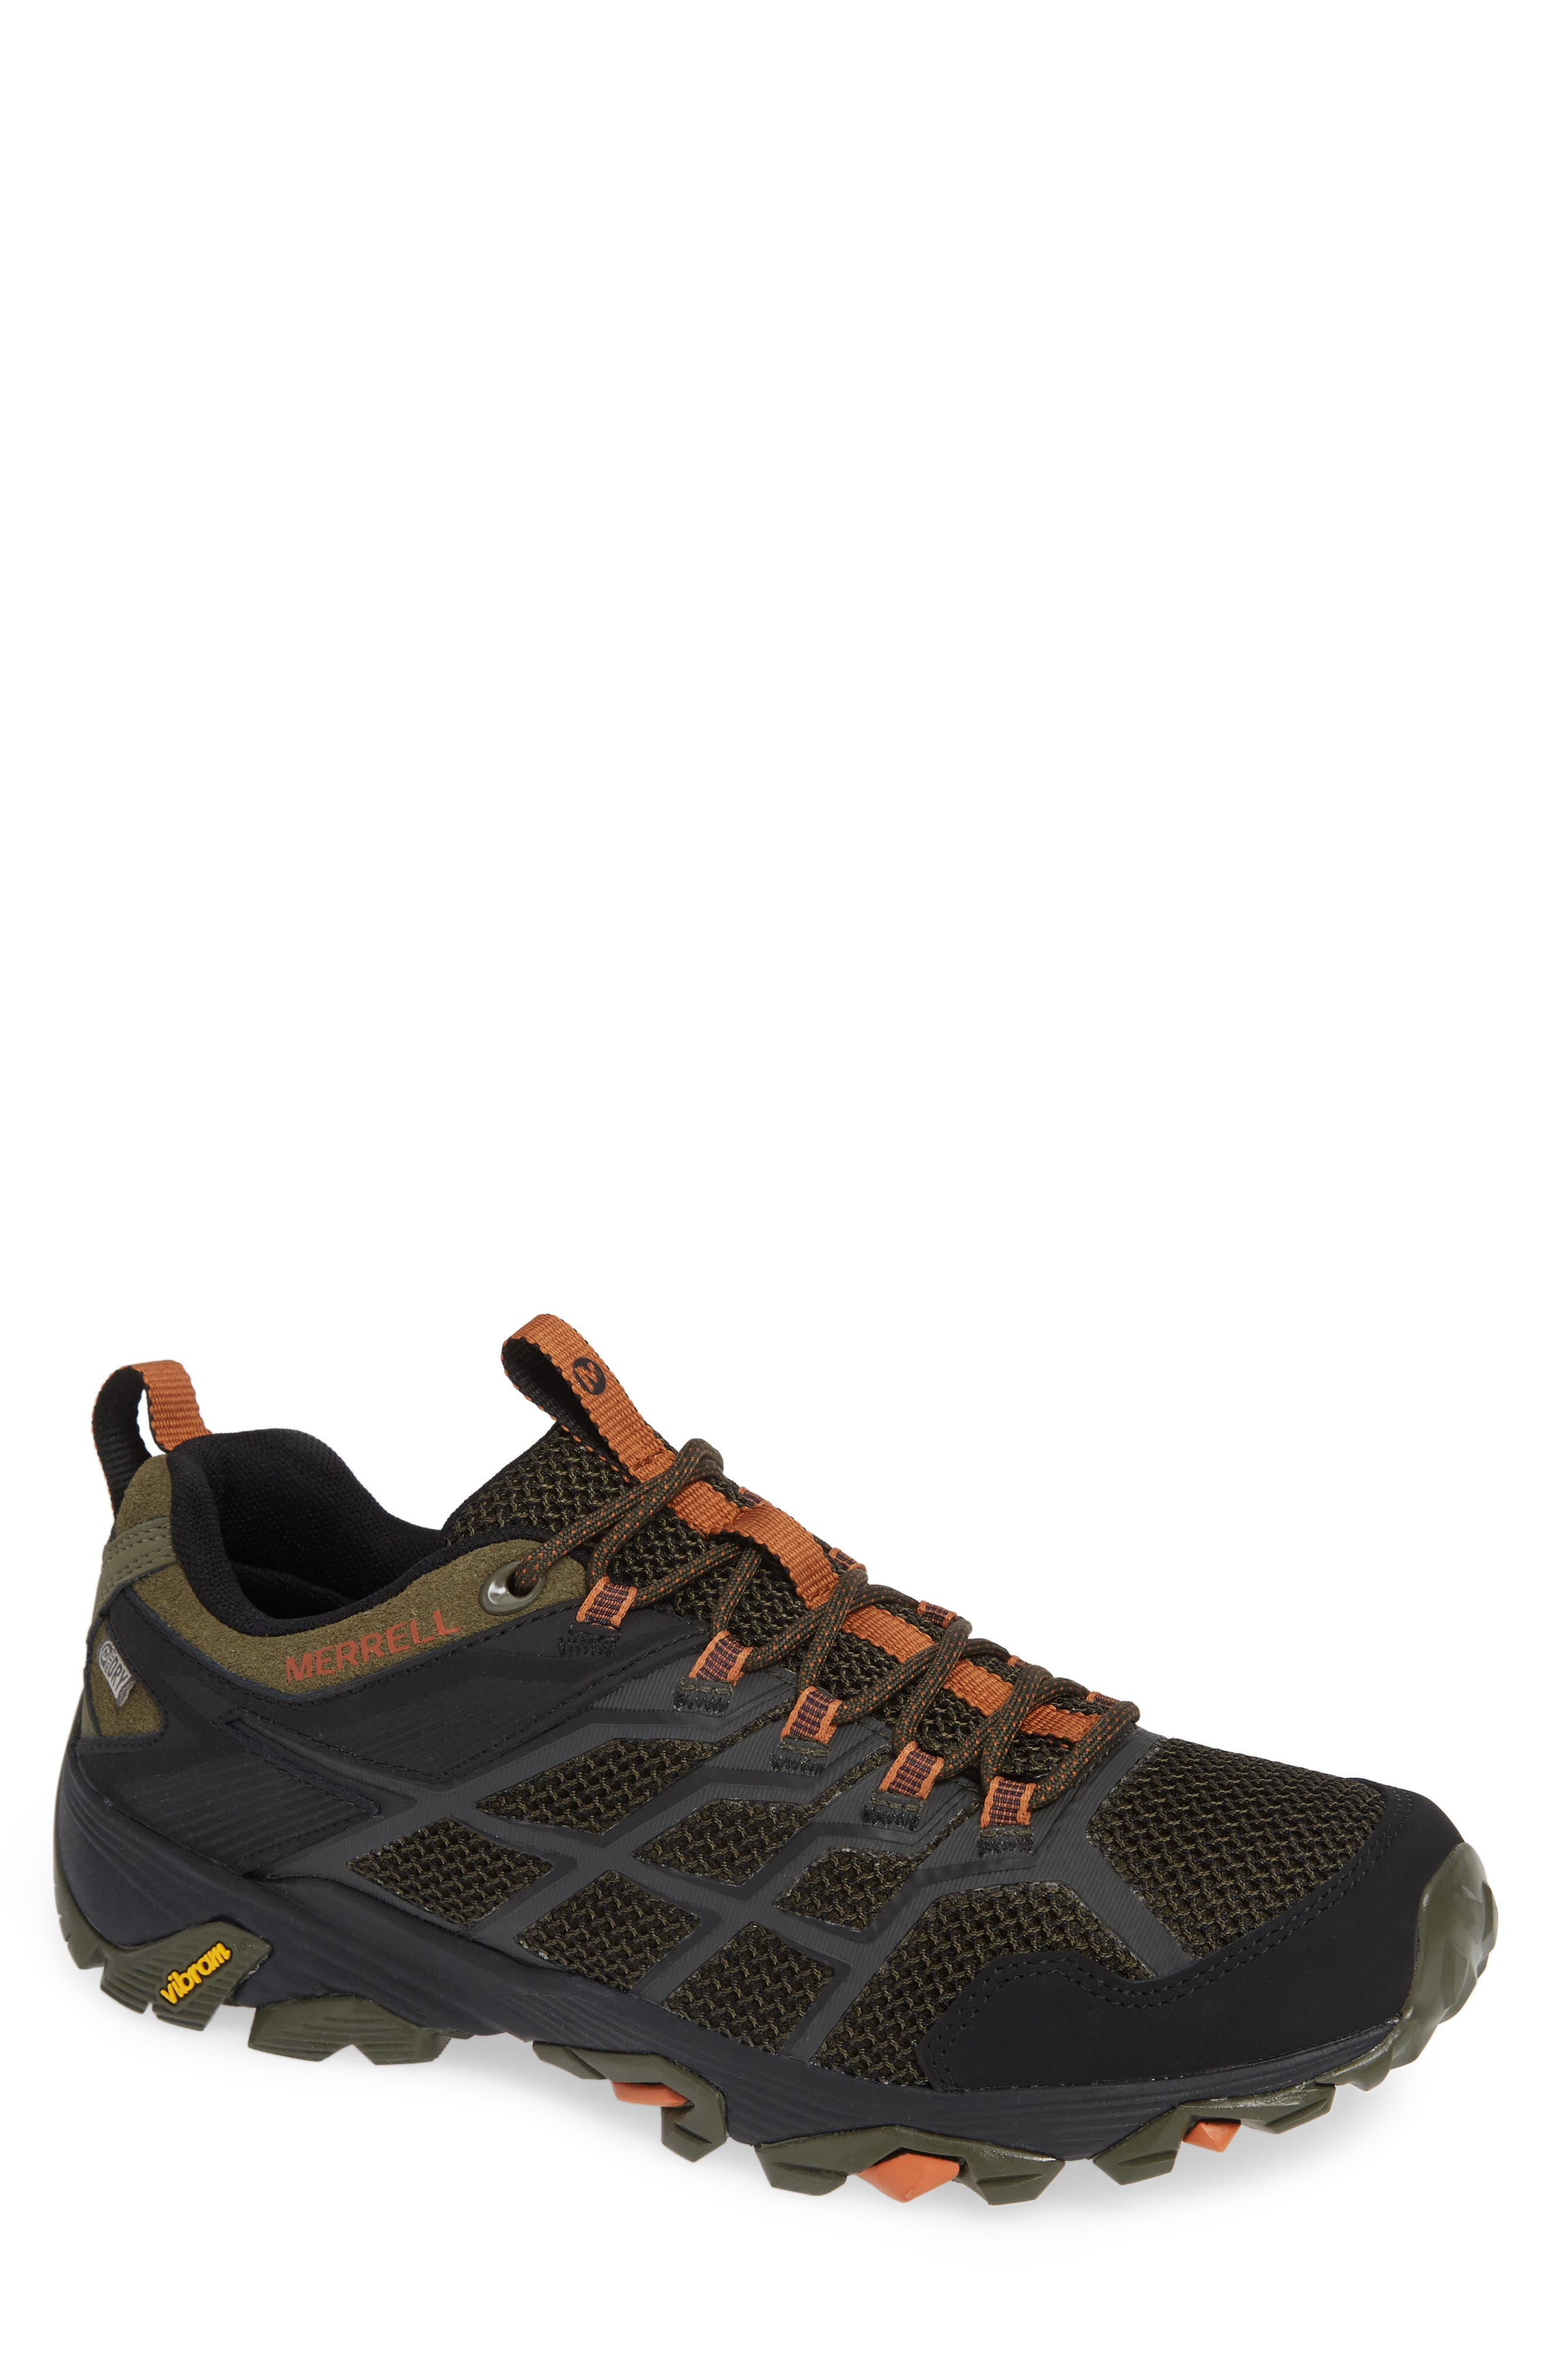 MERRELL Moab FST 2 Waterproof Hiking Shoe, Main, color, OLIVE/ ADOBE